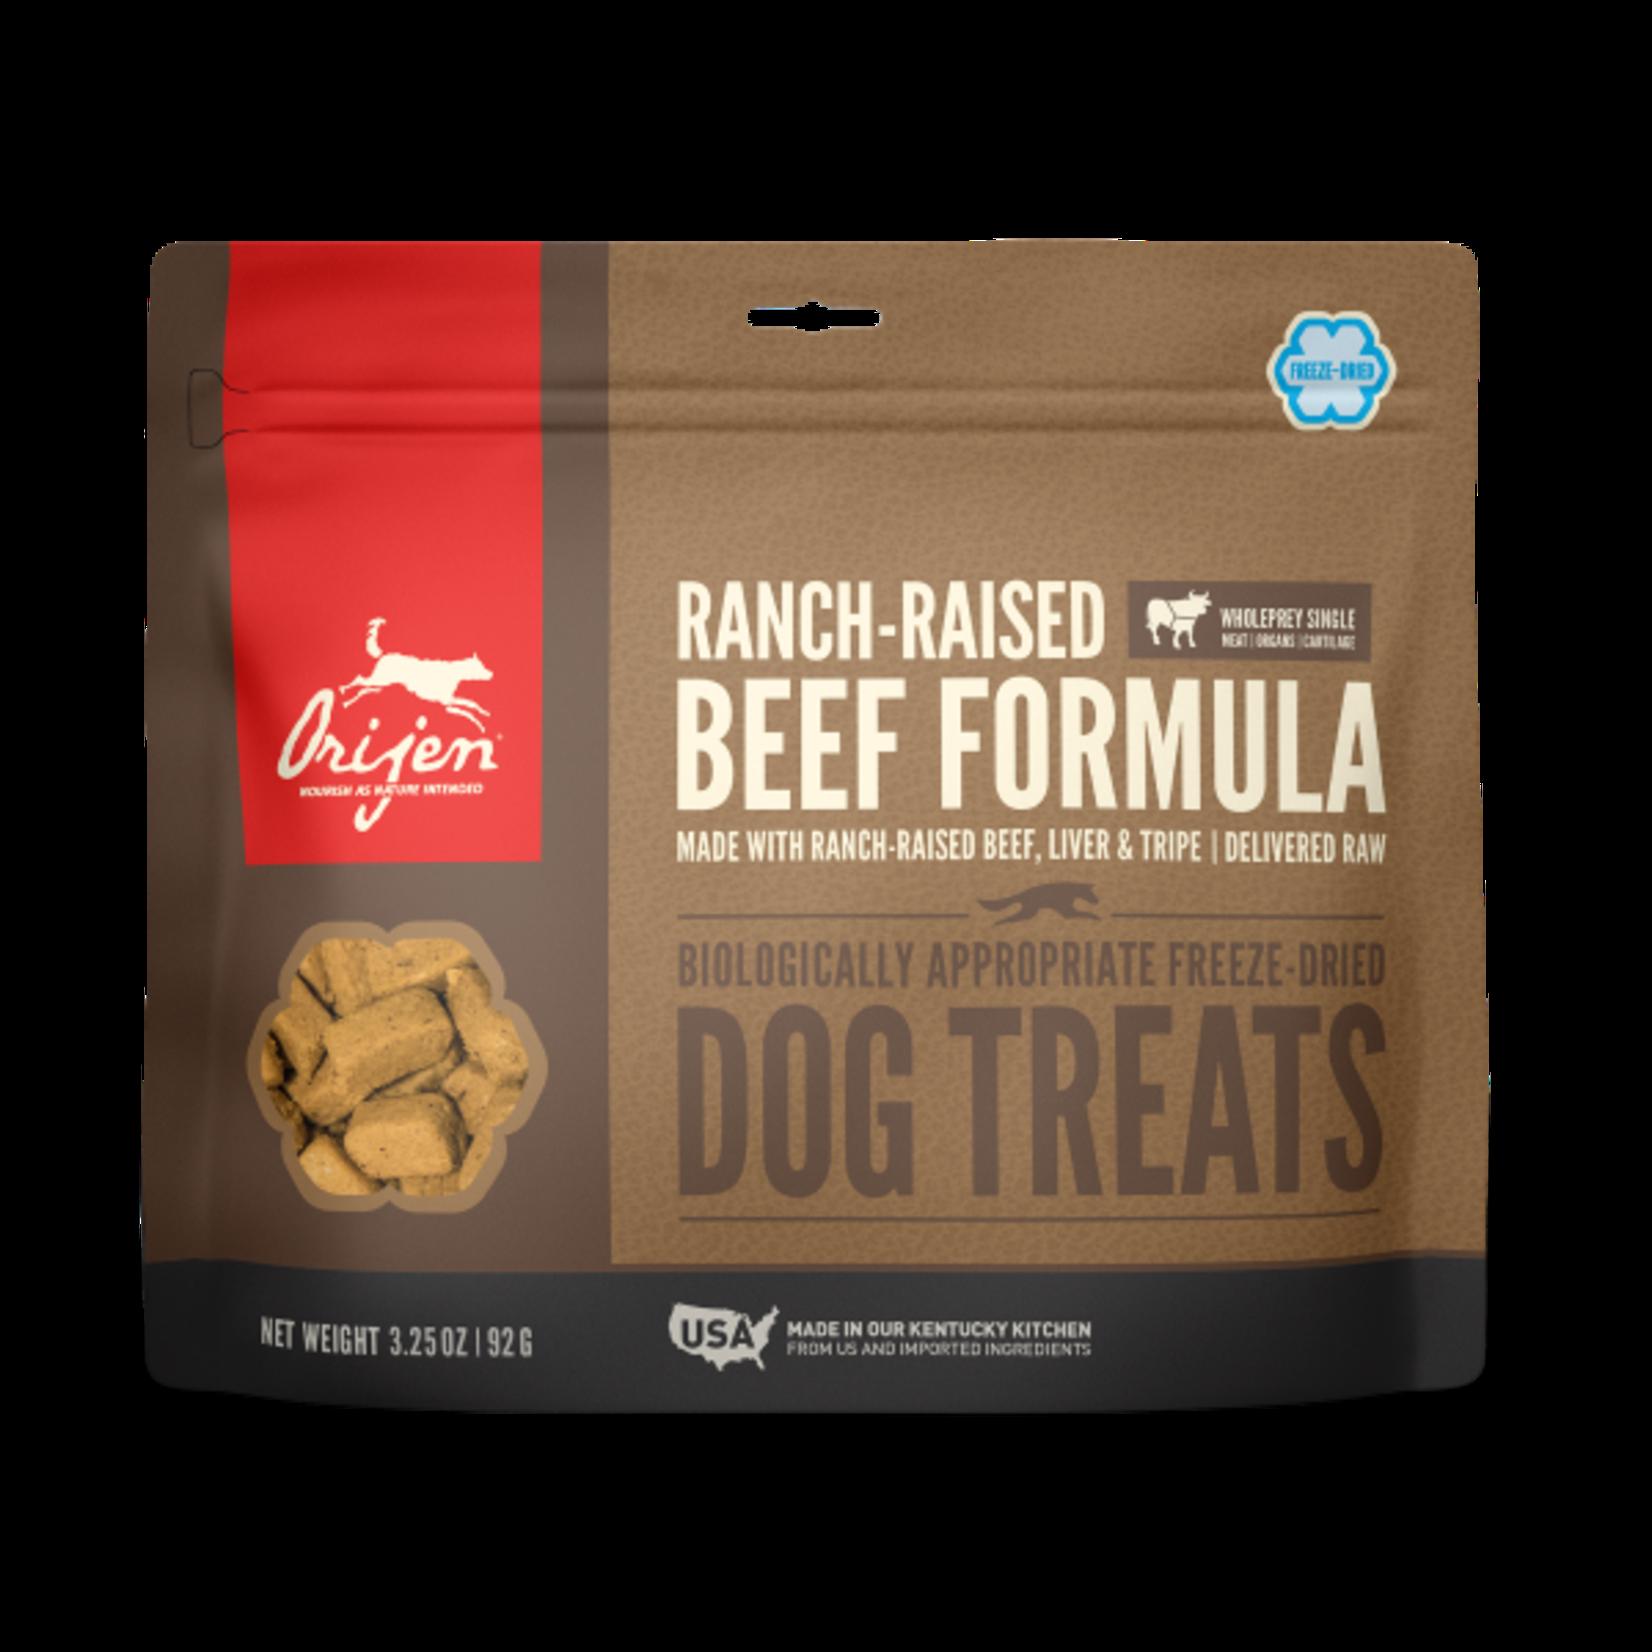 Champion Pet Foods Orijen Dog Freeze-dried Angus Beef Treat 3.25 OZ